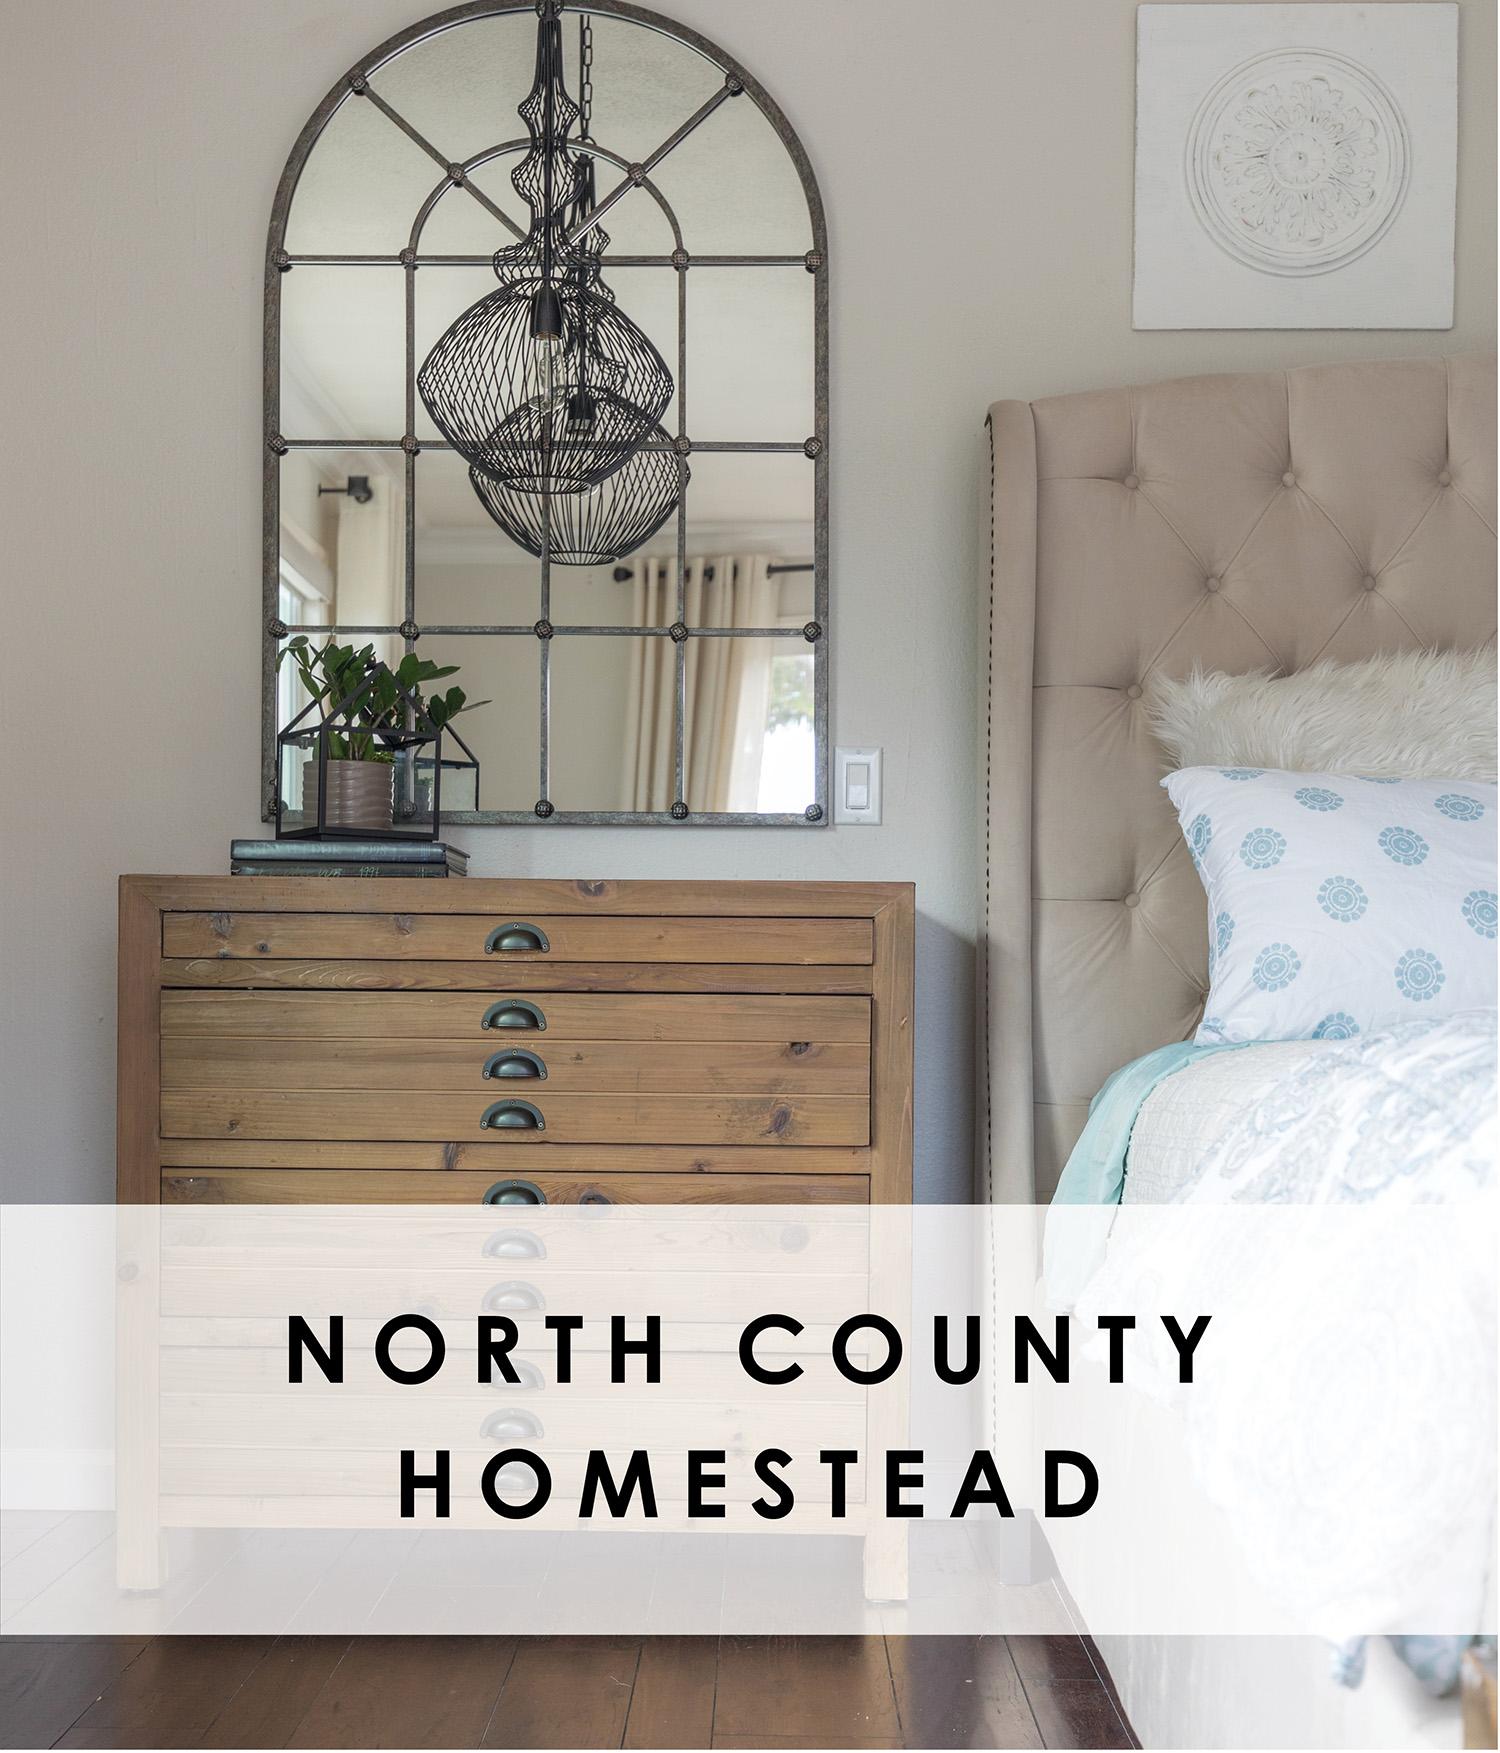 North County Homestead.jpg